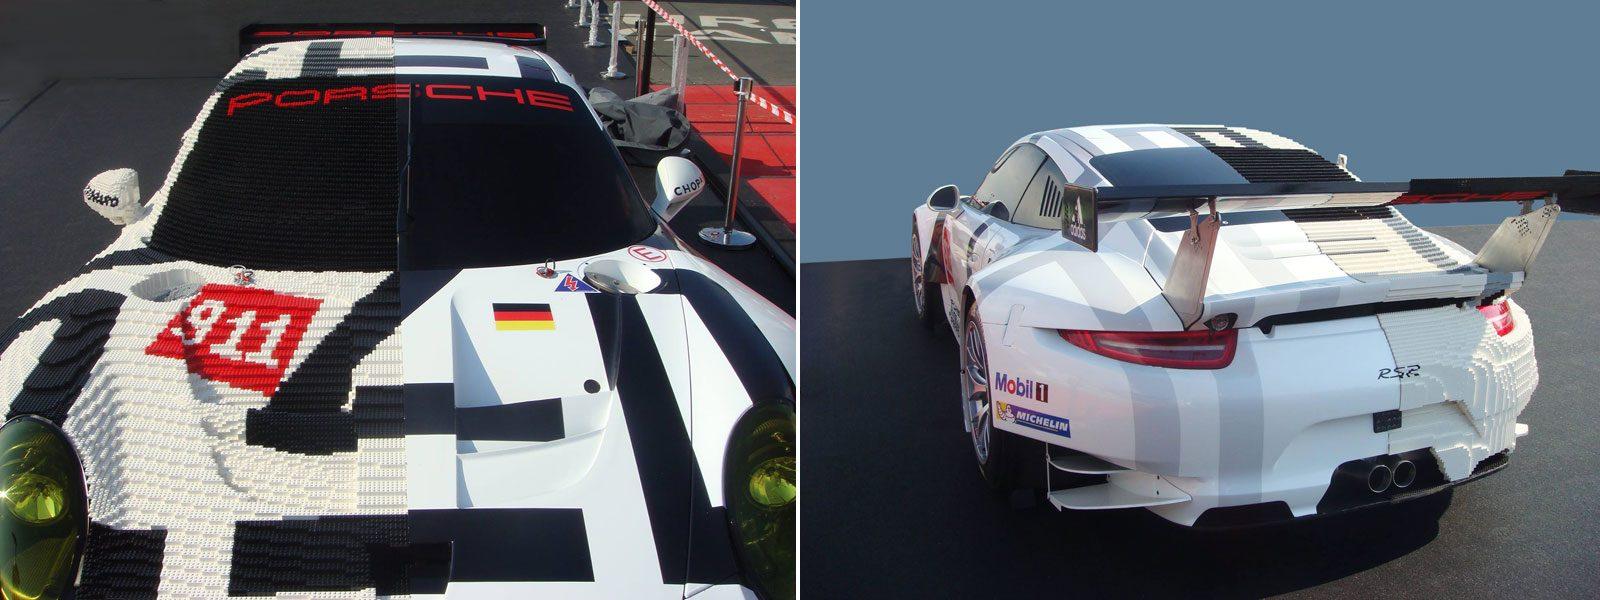 Porsche 911 RSR - half Lego brick body/half original body